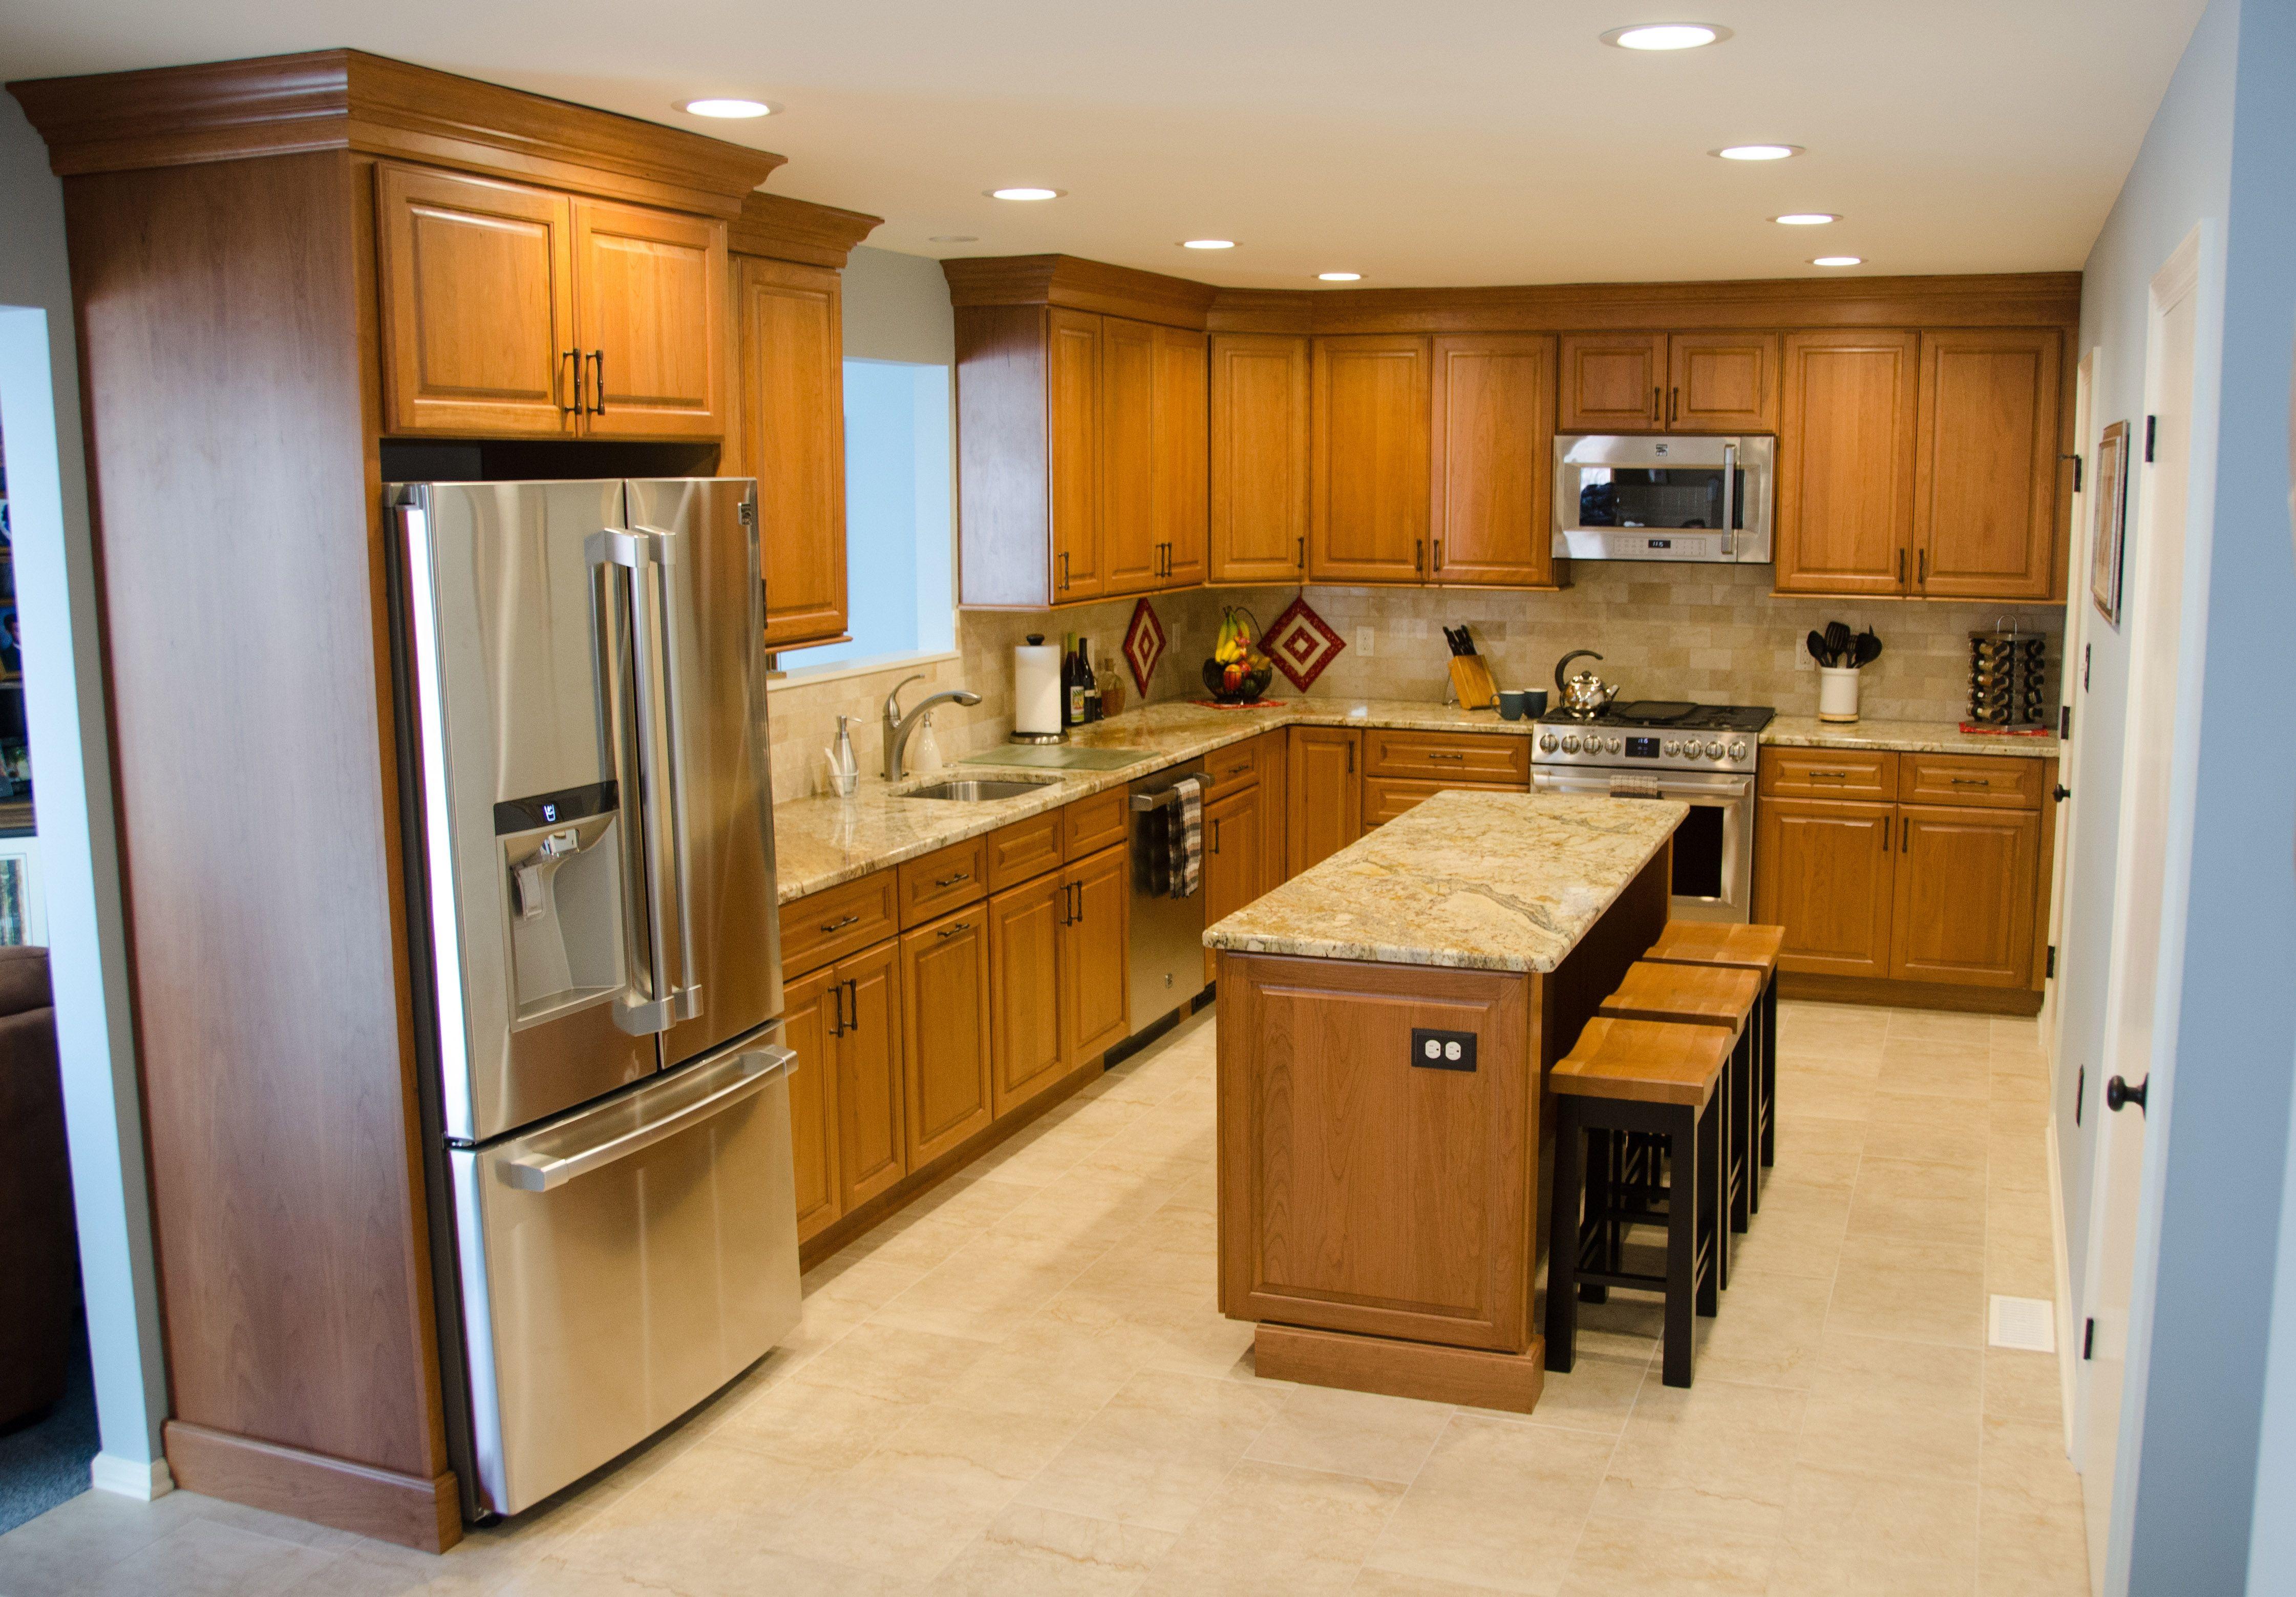 Blue And Brown Kitchen With Beautiful Medium Wood Cabinets Modern Kitchen Design Medium Wood Kitchen Cabinets Kitchen Design